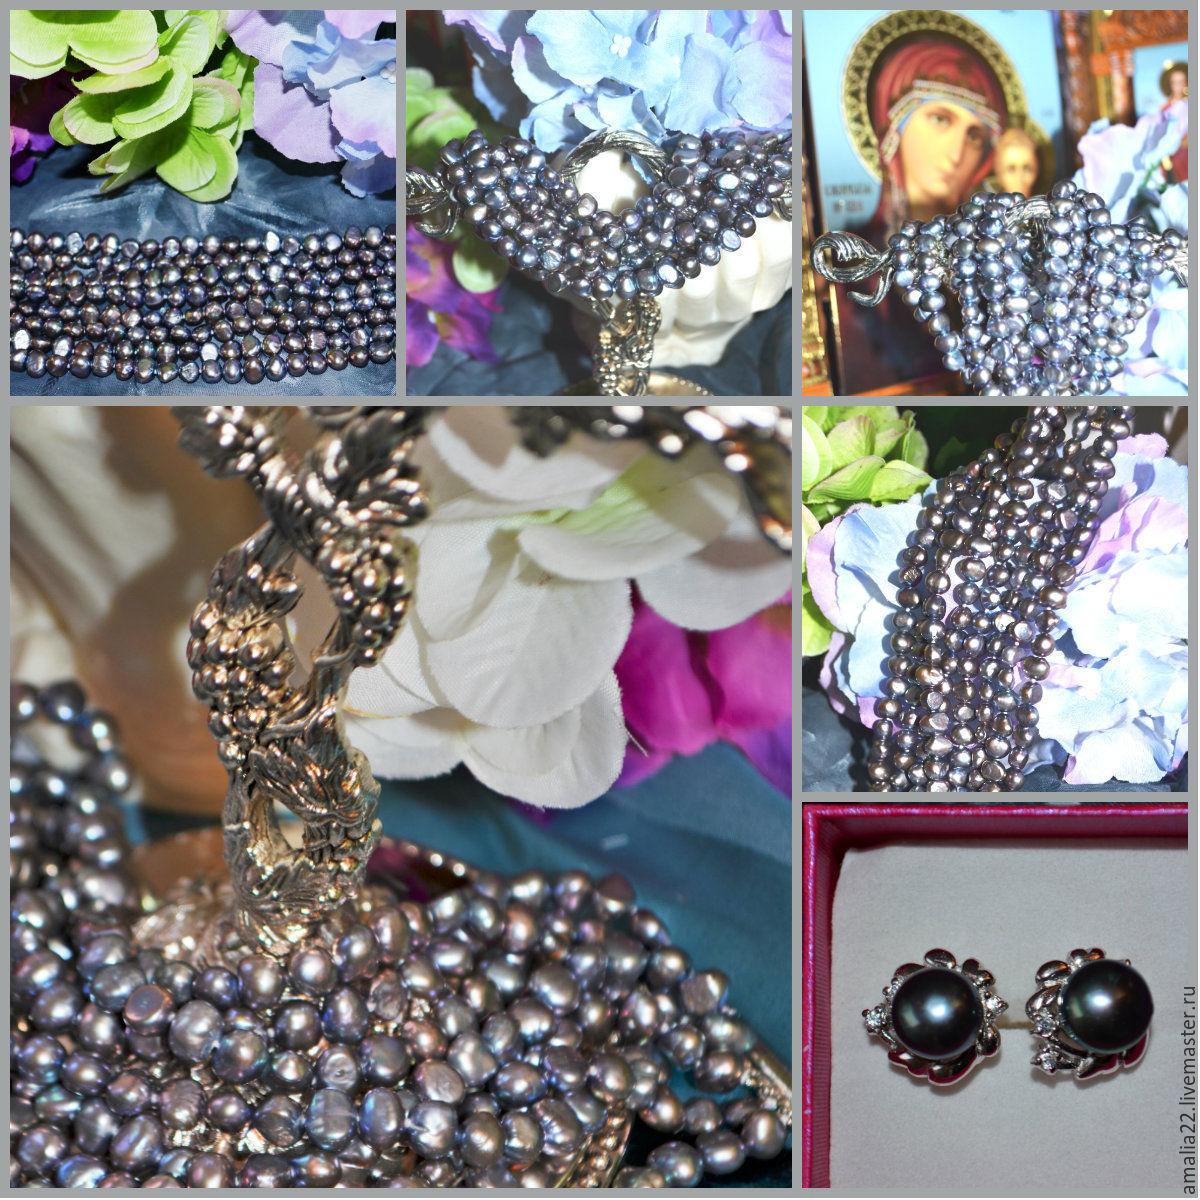 Bracelet Grey pearl Baroque. Pearls grey freshwater overflow, Bead bracelet, Moscow,  Фото №1